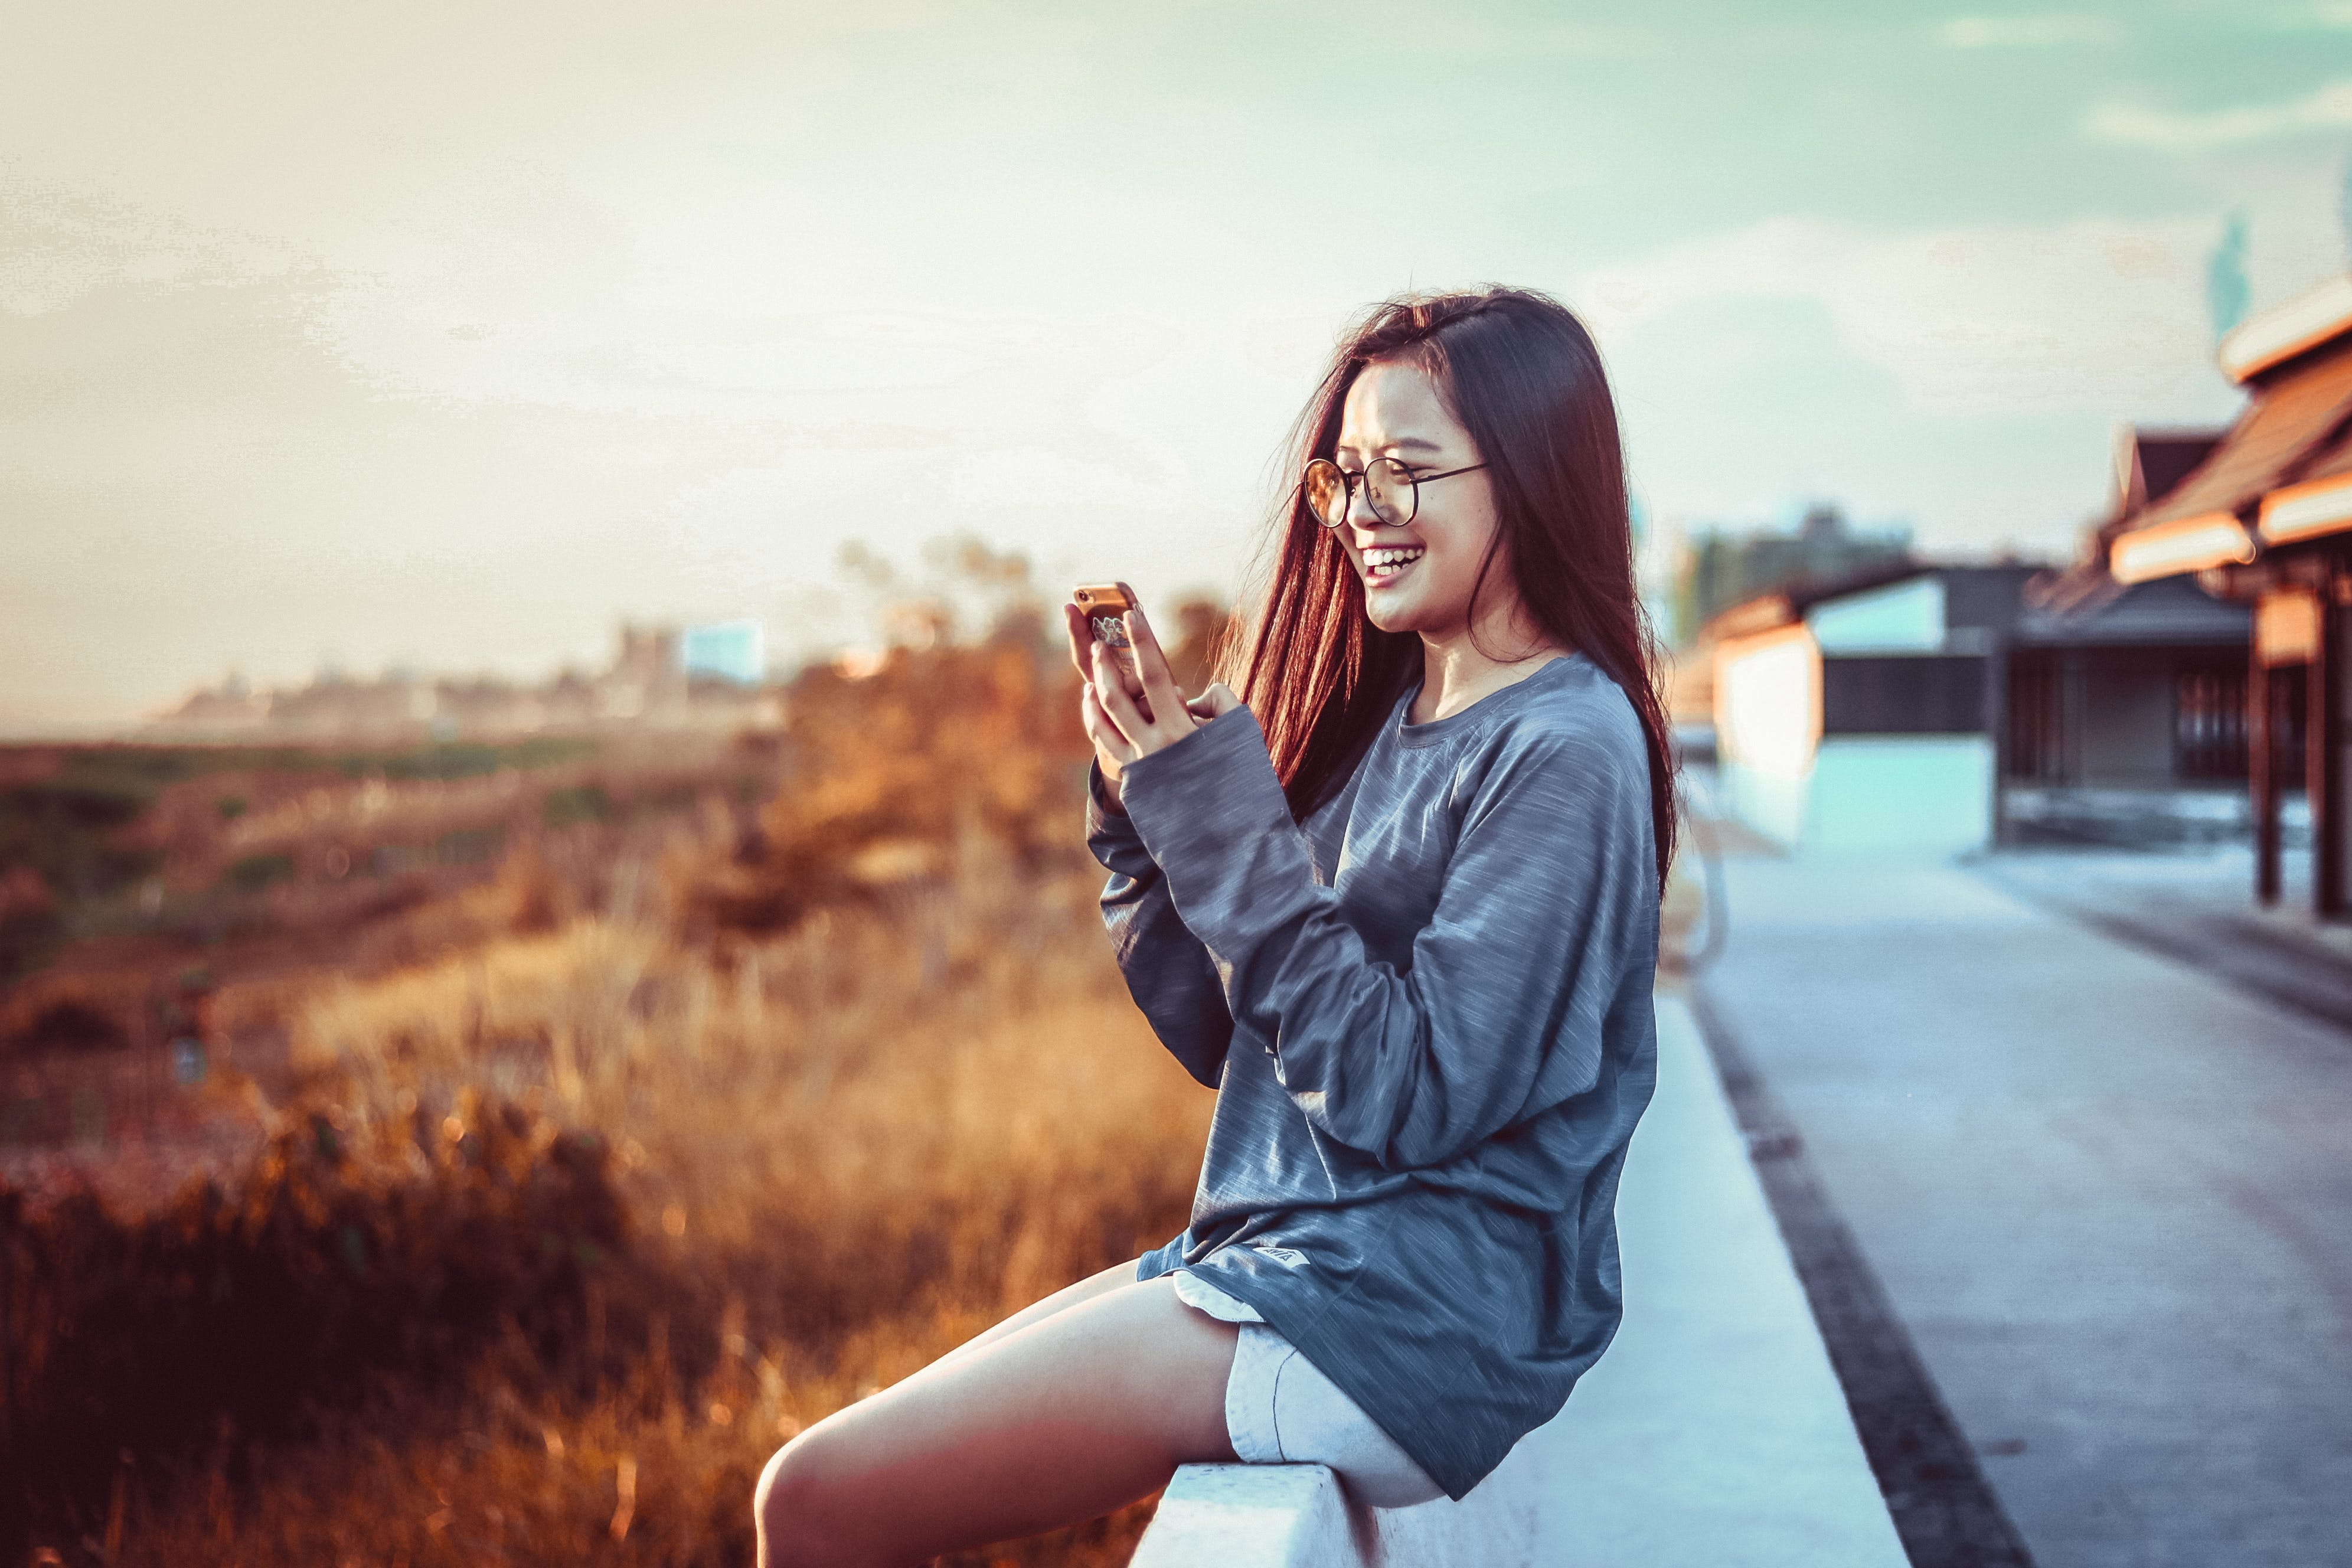 Woman Sitting Using Phone